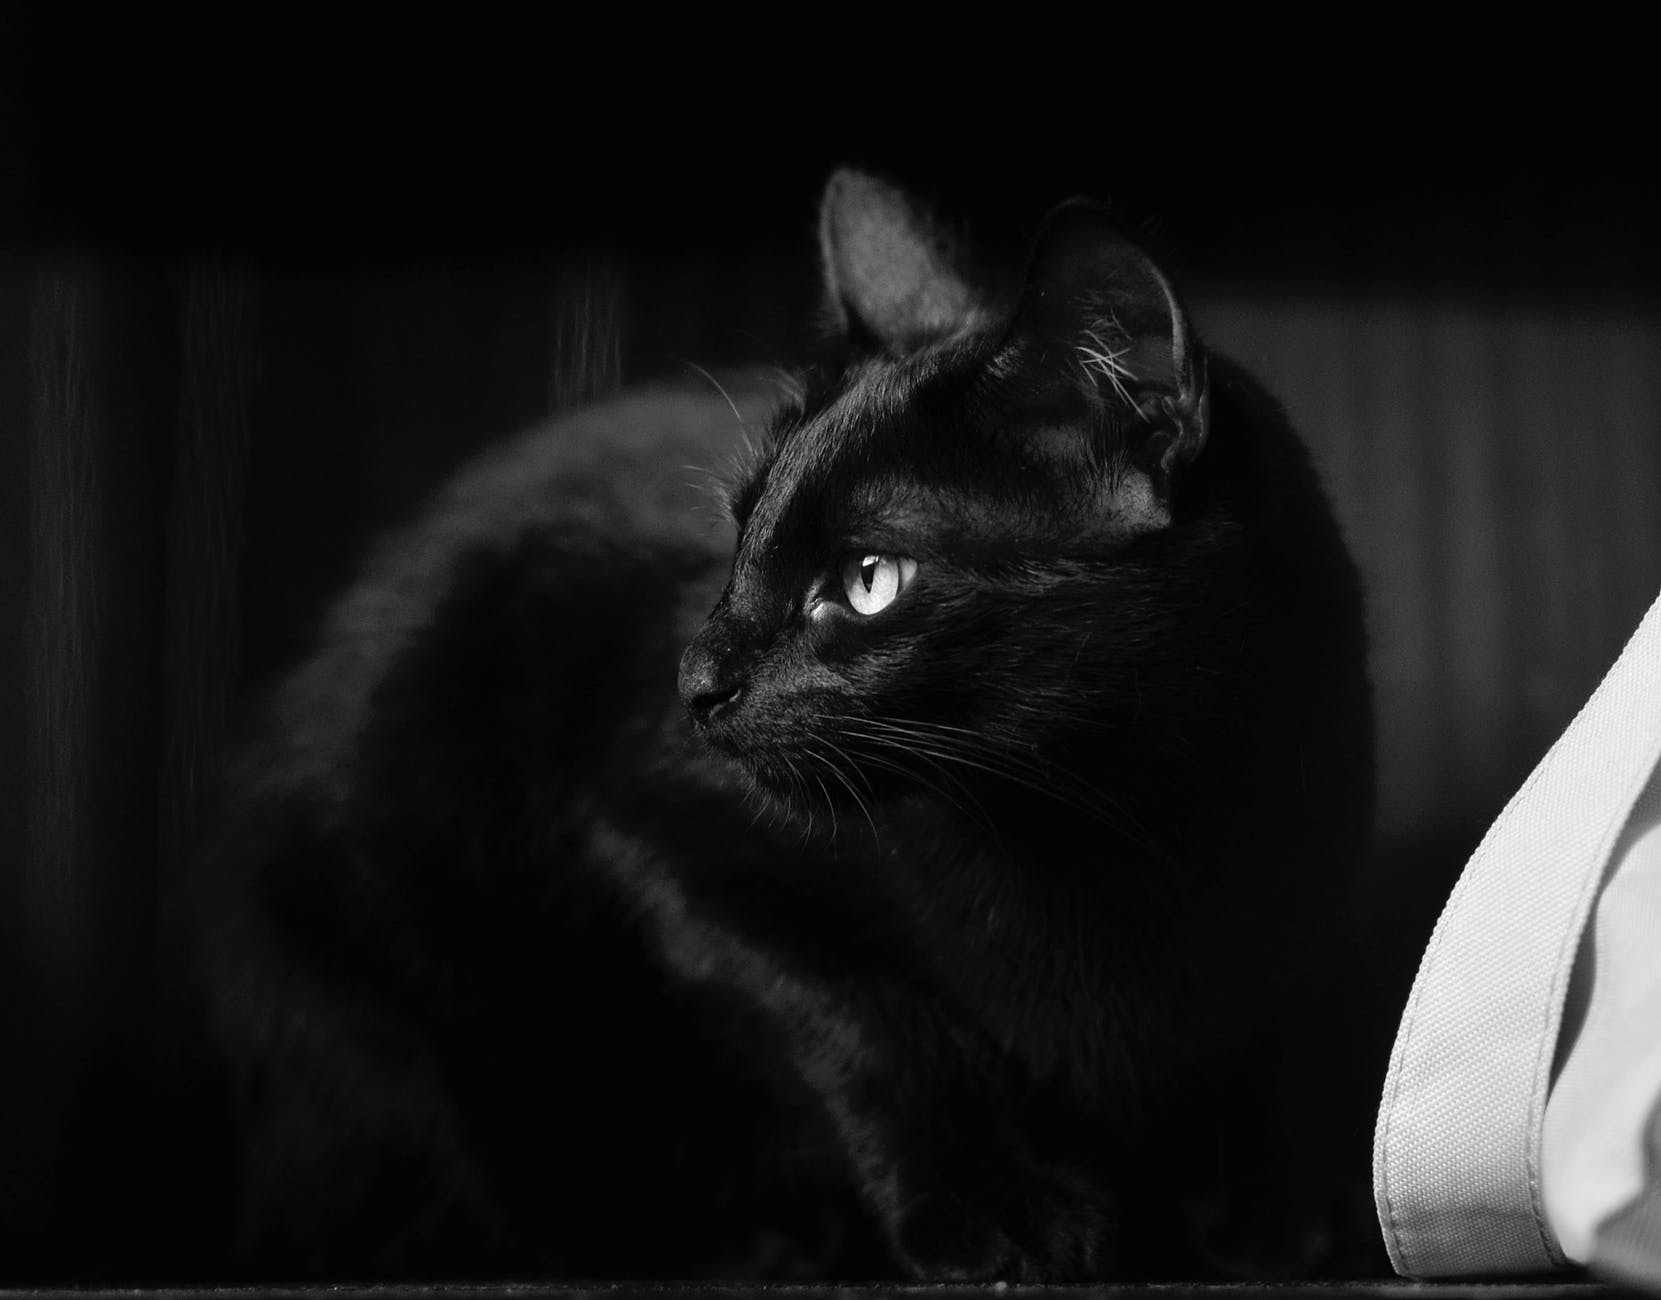 monochrome photography of black cat